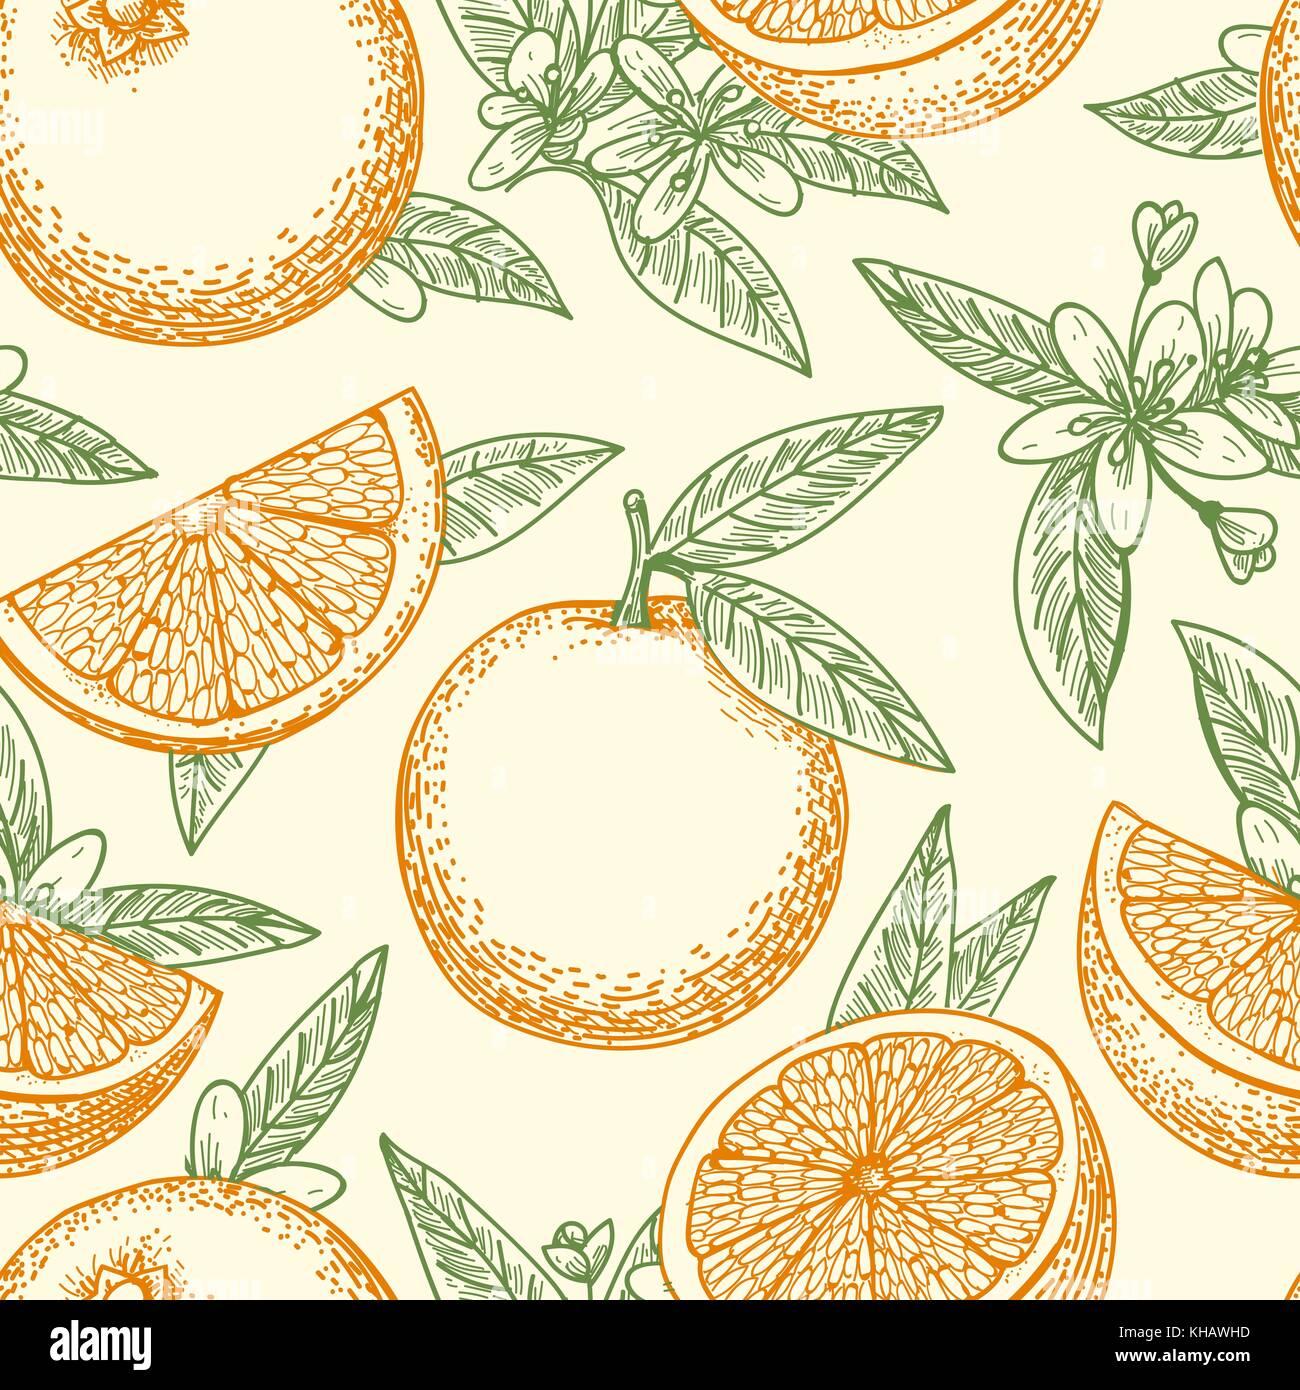 Fruta Naranja Patron Dibujado A Mano Amarillo Naranjas Hojas